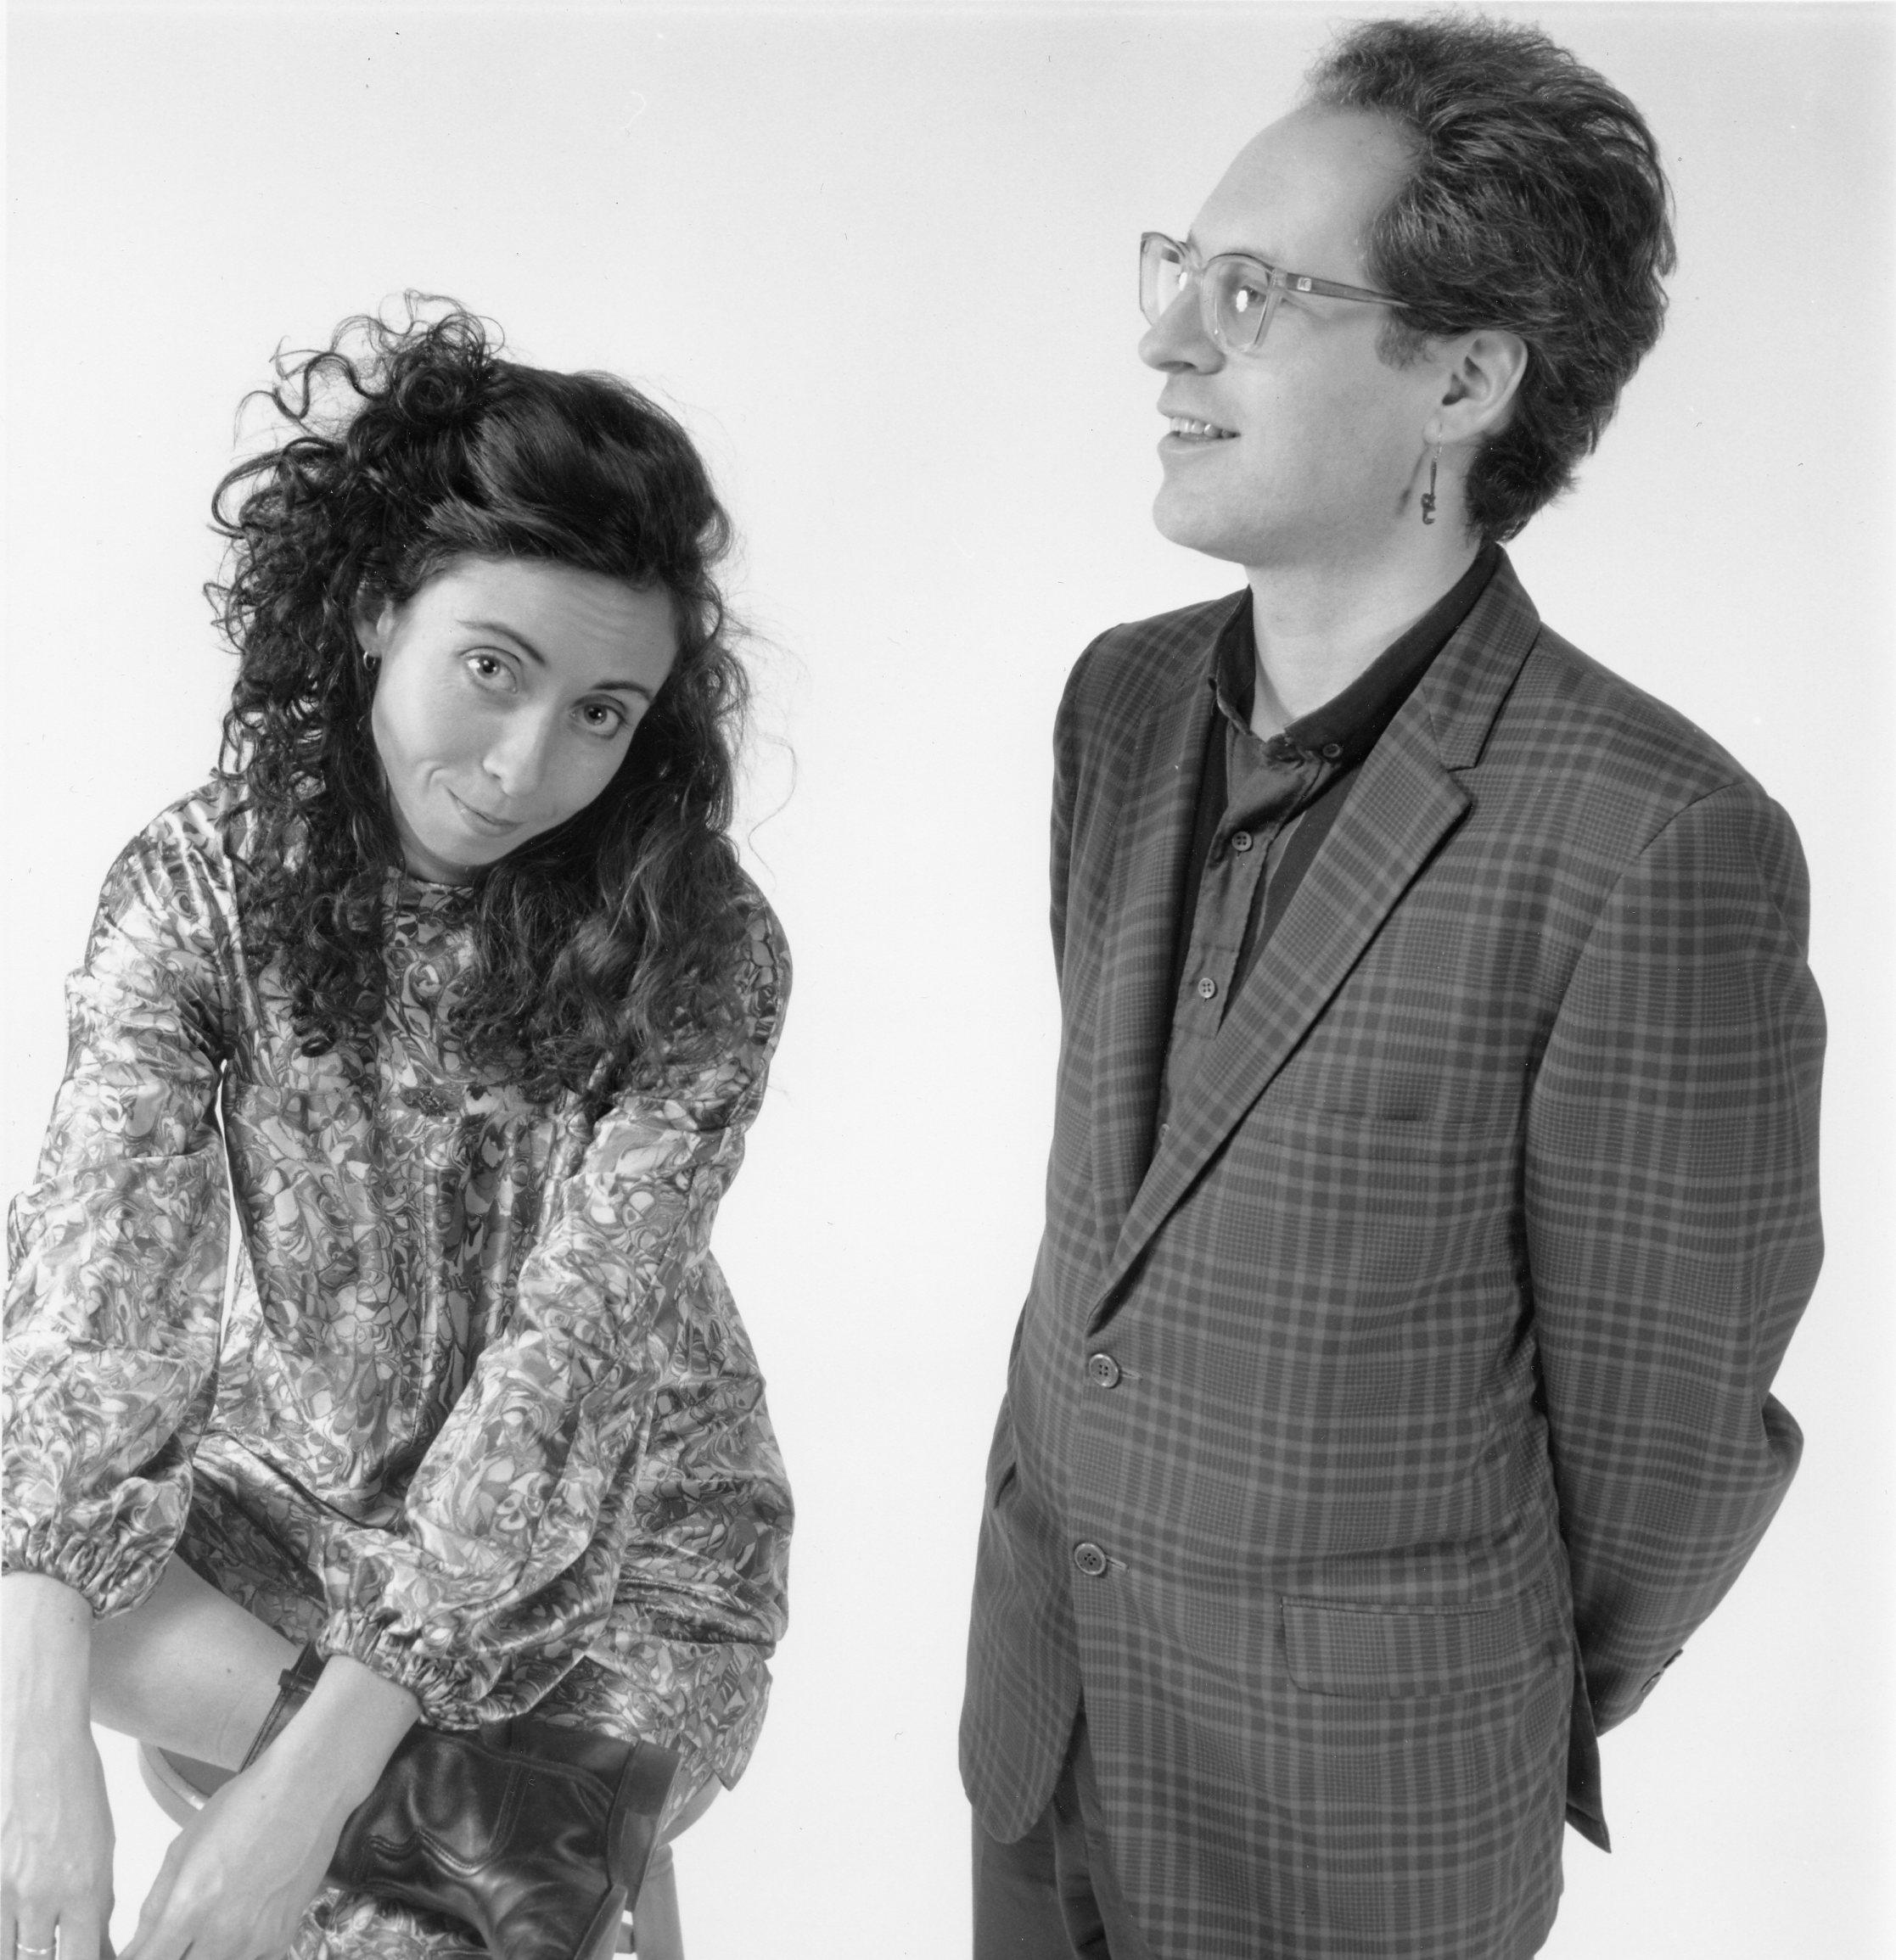 MN, 1993, photo by Jon Snyder